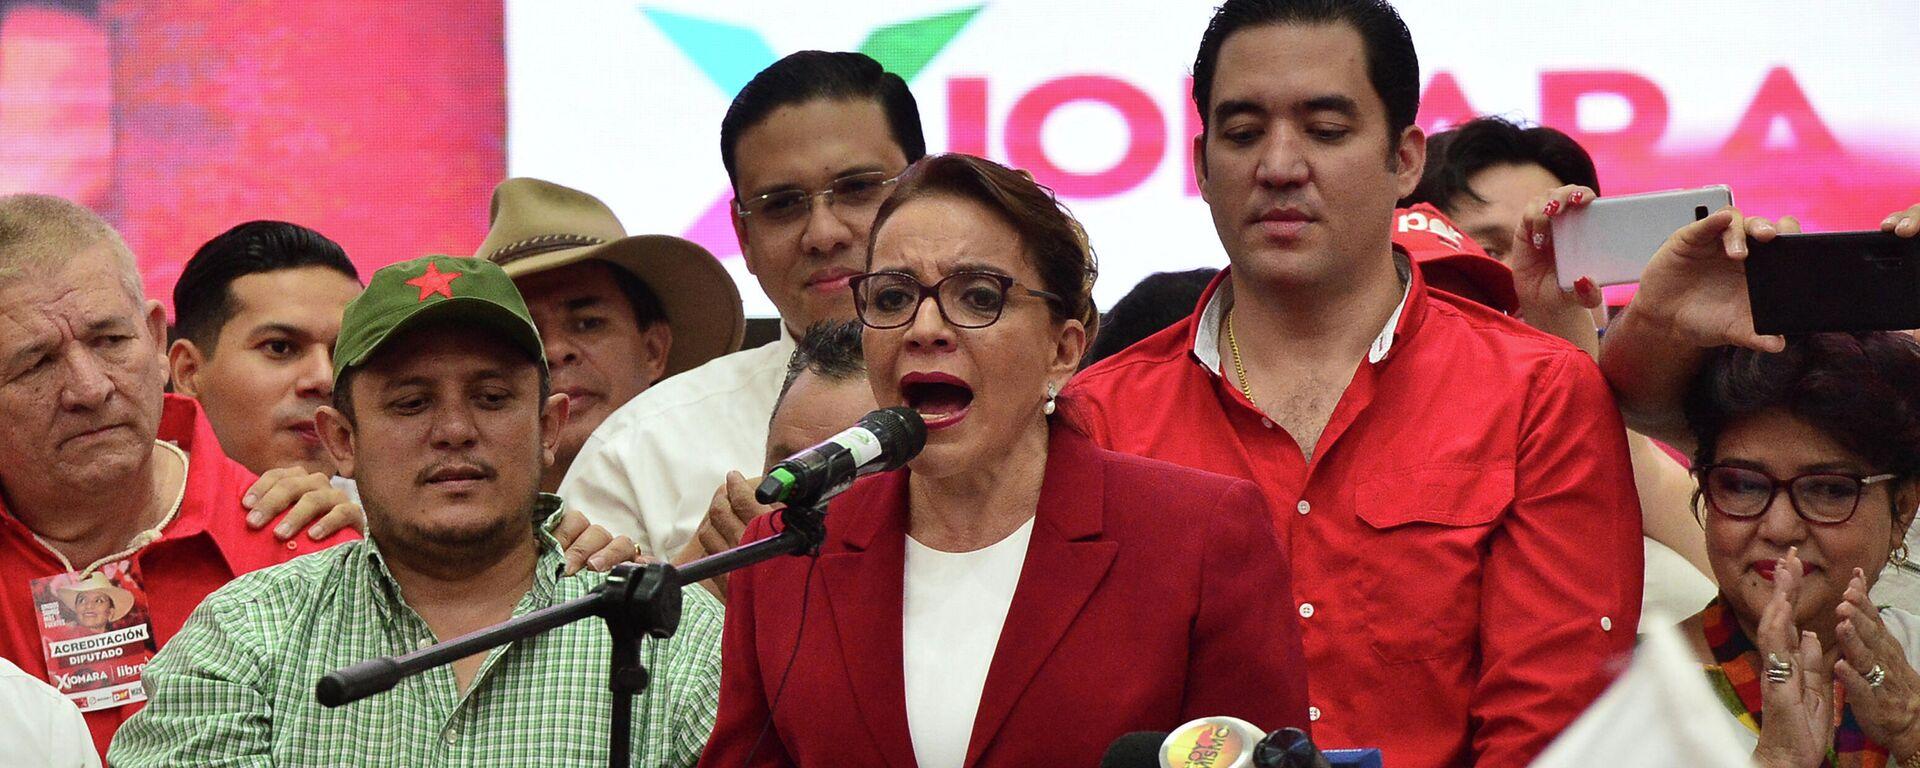 Xiomara Castro, candidata presidenncial hondureña - Sputnik Mundo, 1920, 26.04.2021